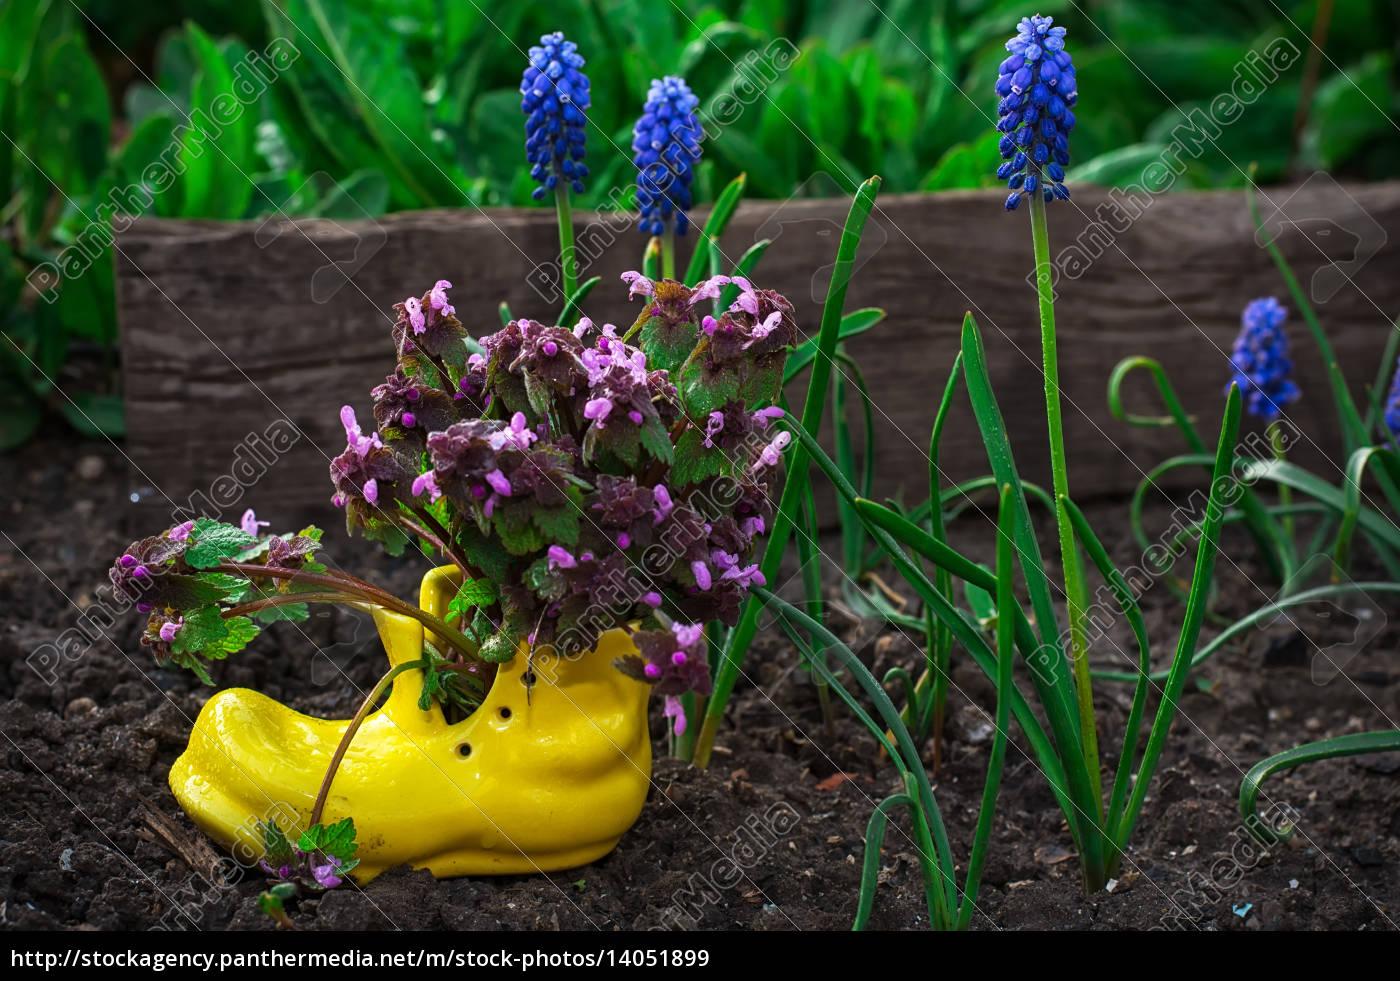 care, of, ornamental, flowers, in, pots - 14051899